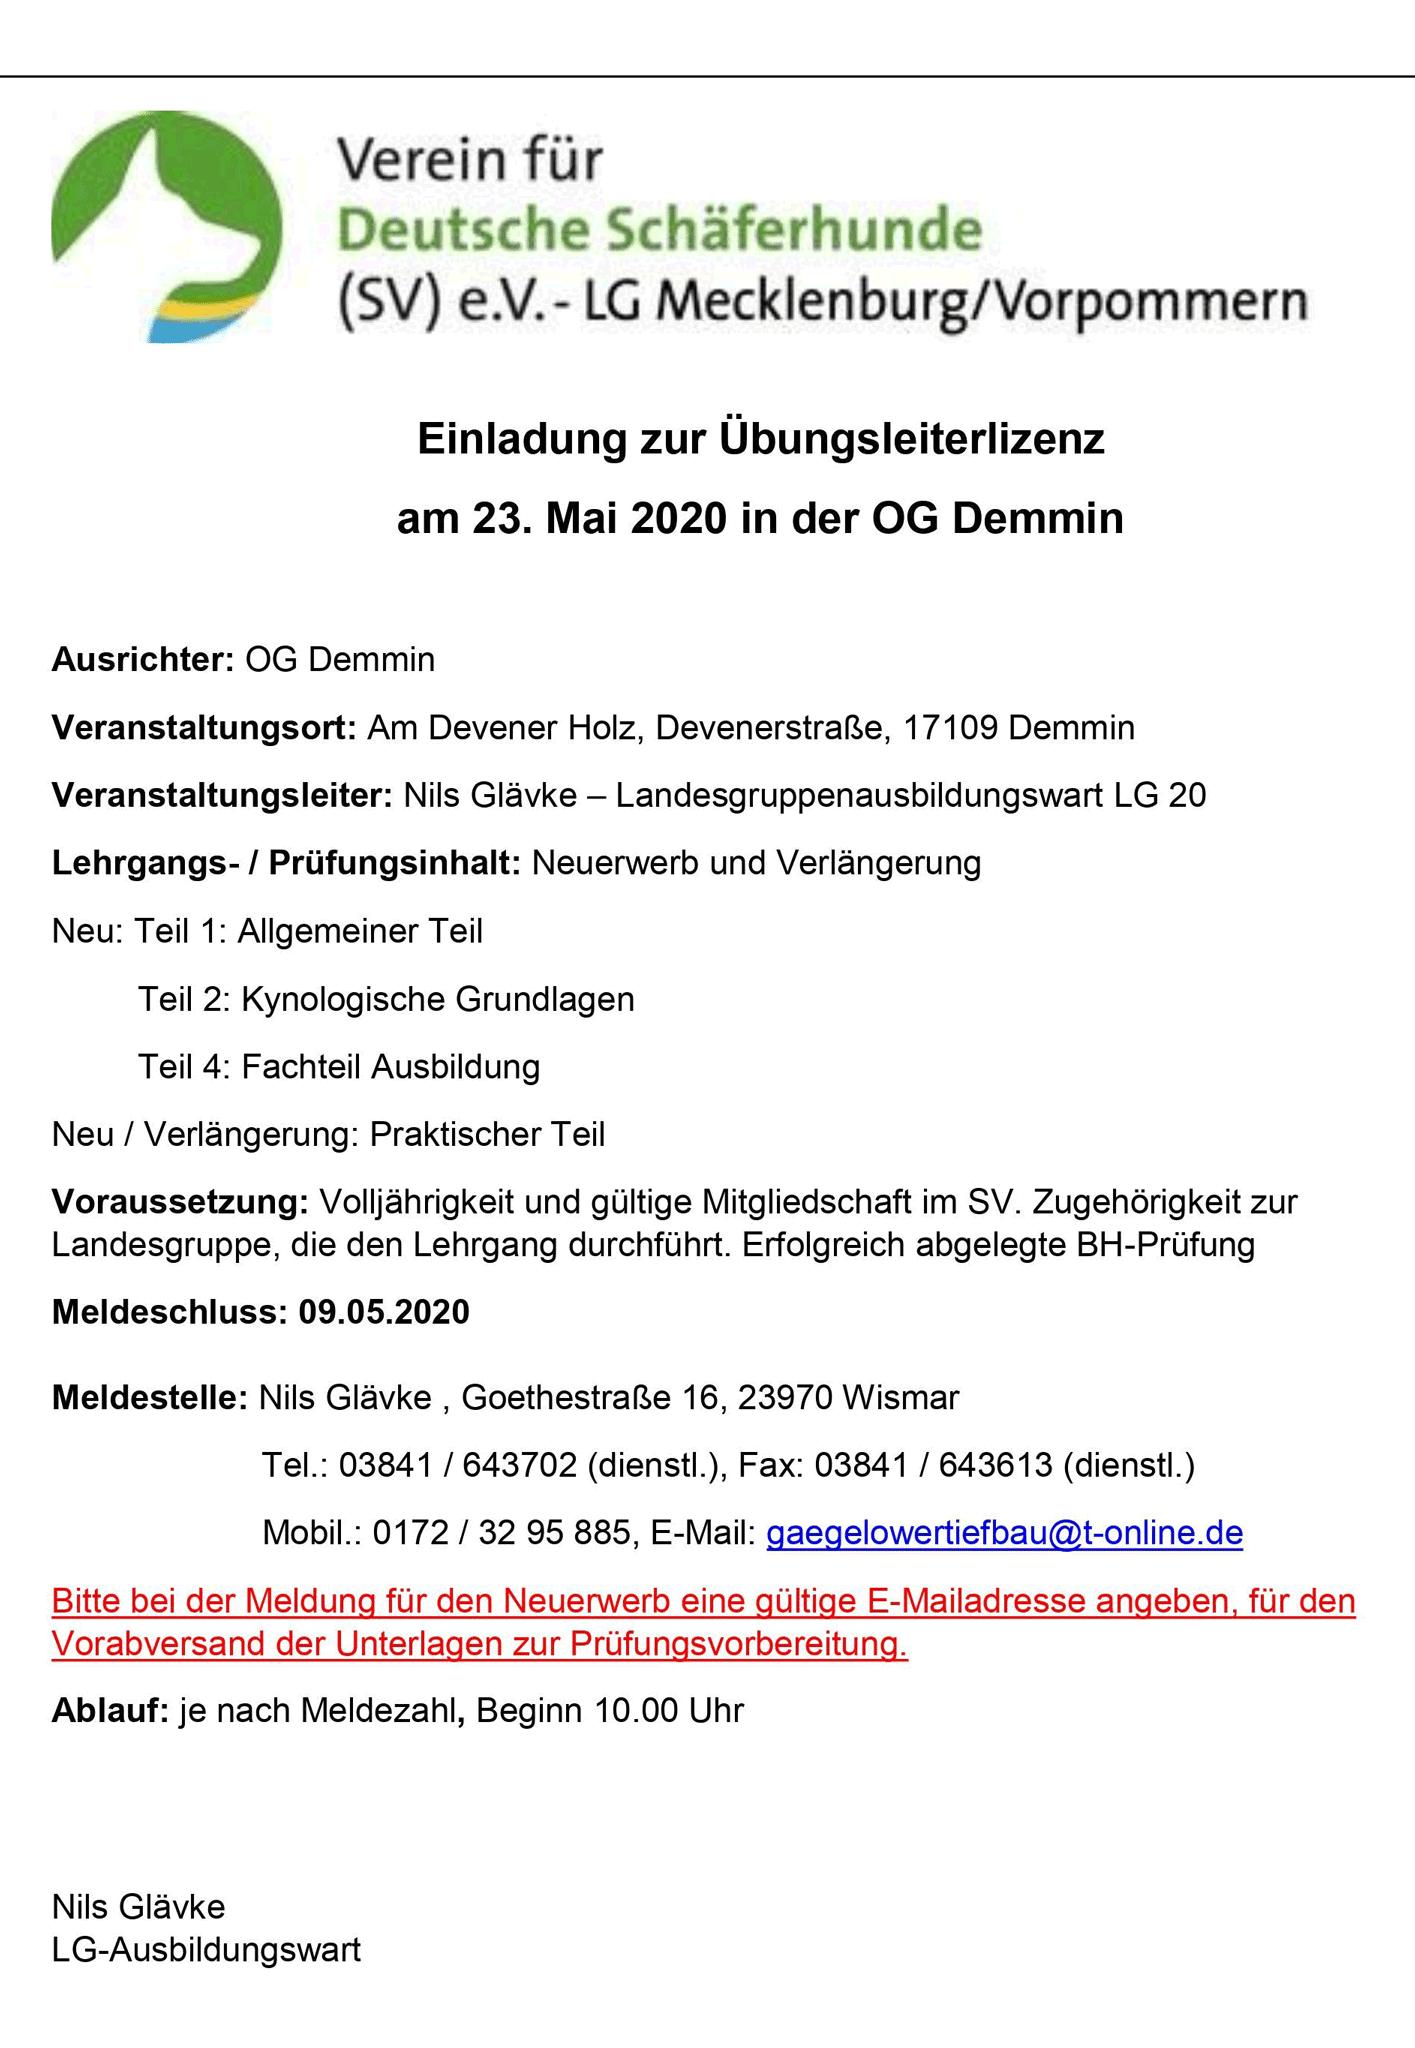 https://www.schaeferhunde-mv.de/images/uploads/lizenz_uel.png